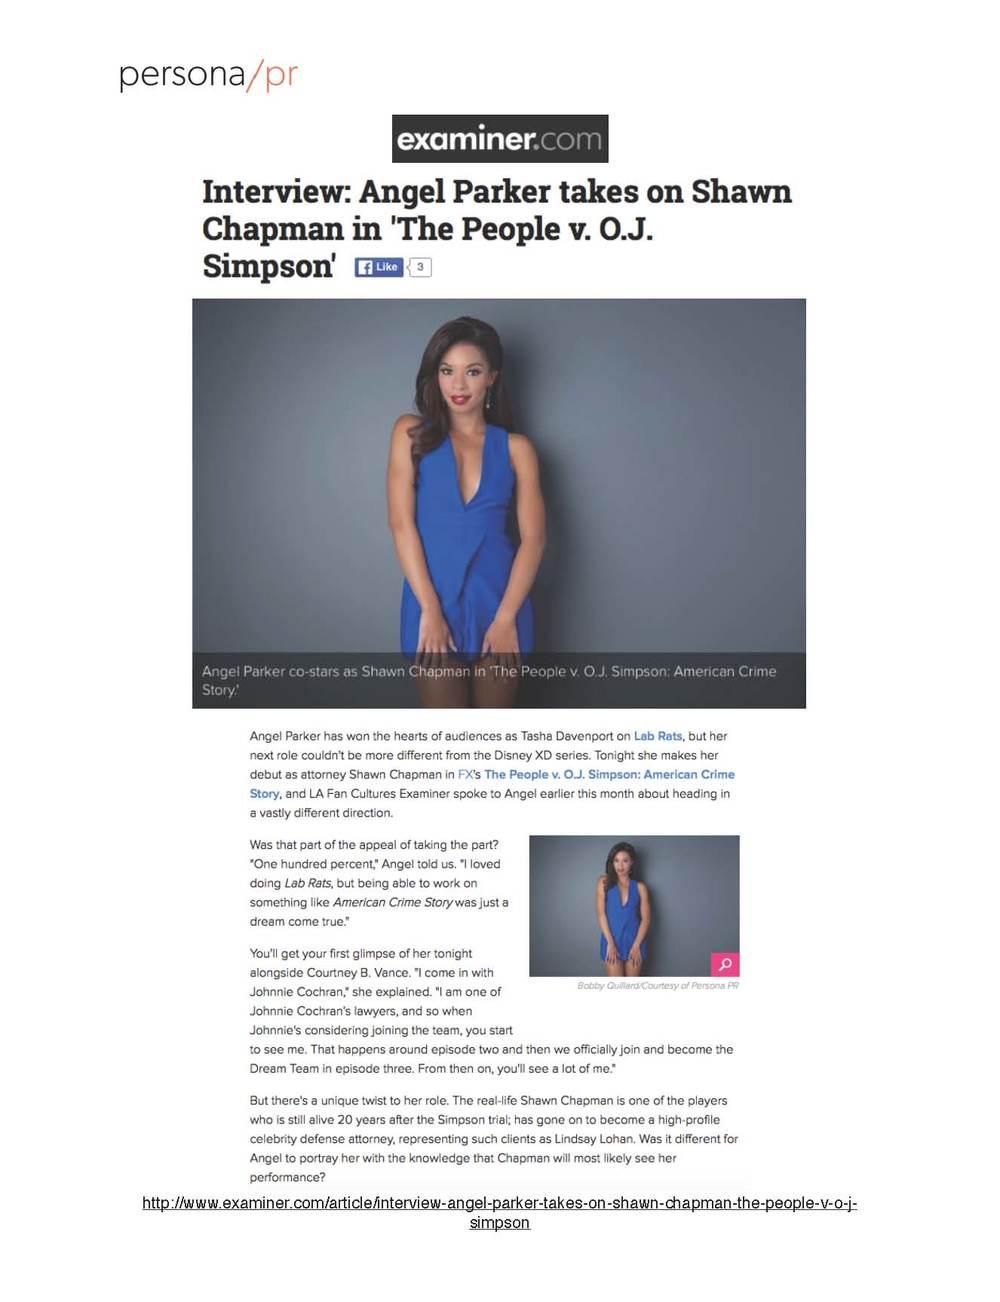 AngelParker-Examiner-02.09.16_Page_1.jpg